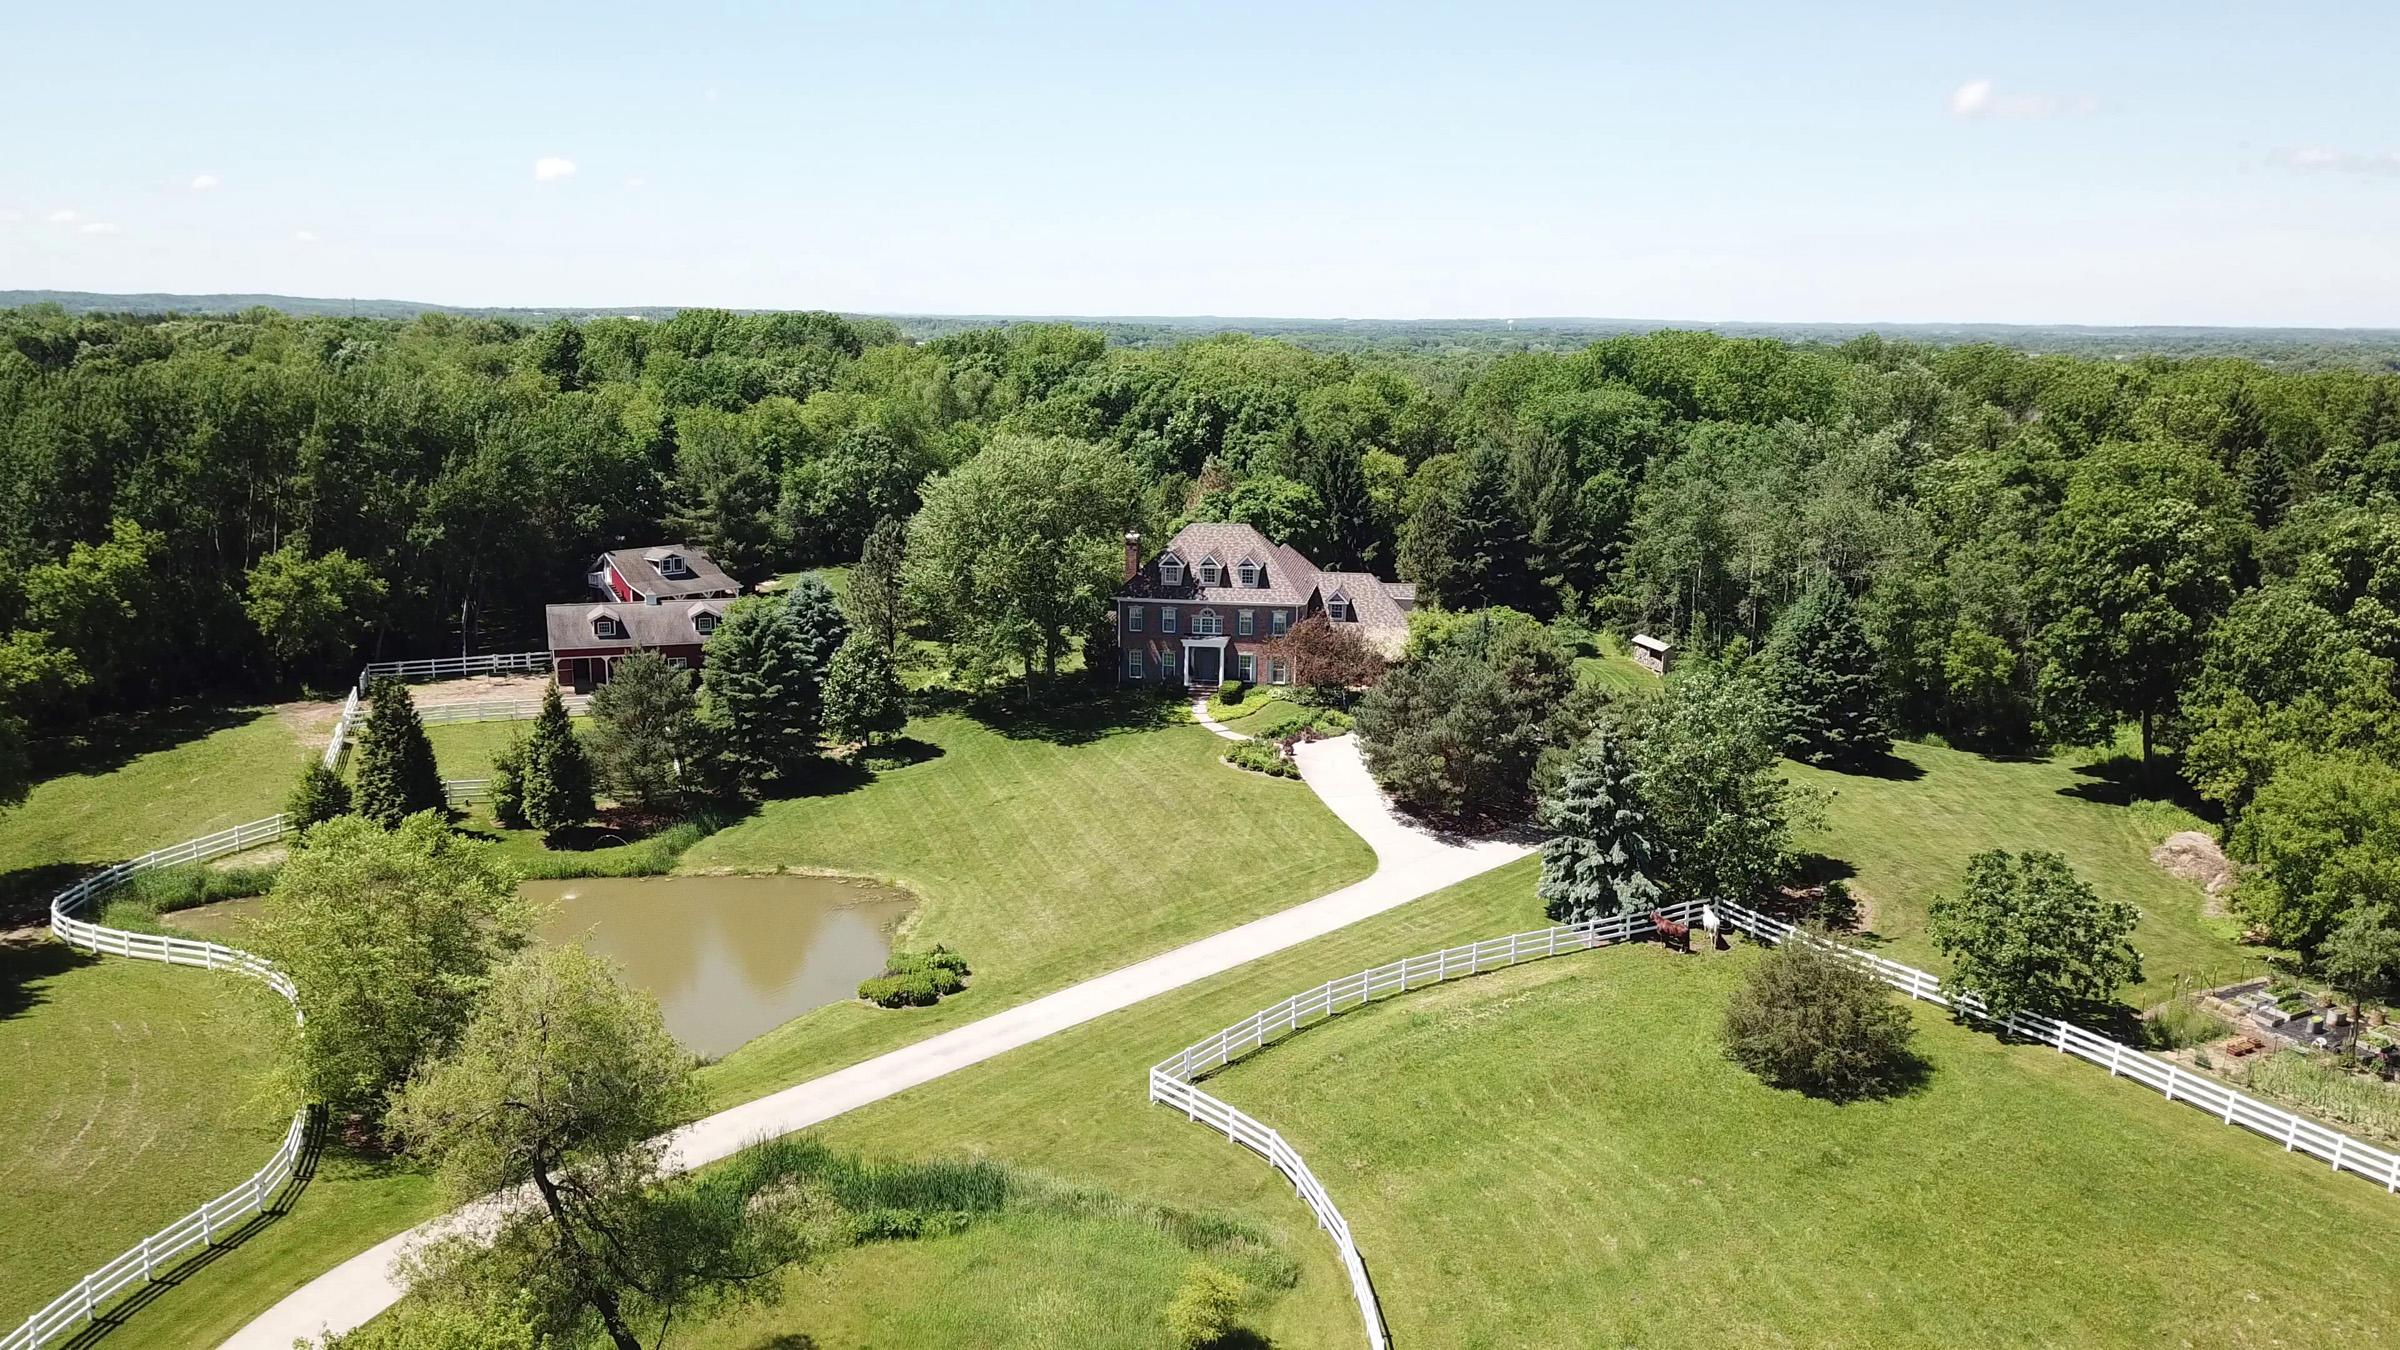 W330N243 Kettle Moraine Dr, Delafield, Wisconsin 53018, 4 Bedrooms Bedrooms, 10 Rooms Rooms,2 BathroomsBathrooms,Single-Family,For Sale,Kettle Moraine Dr,1717803